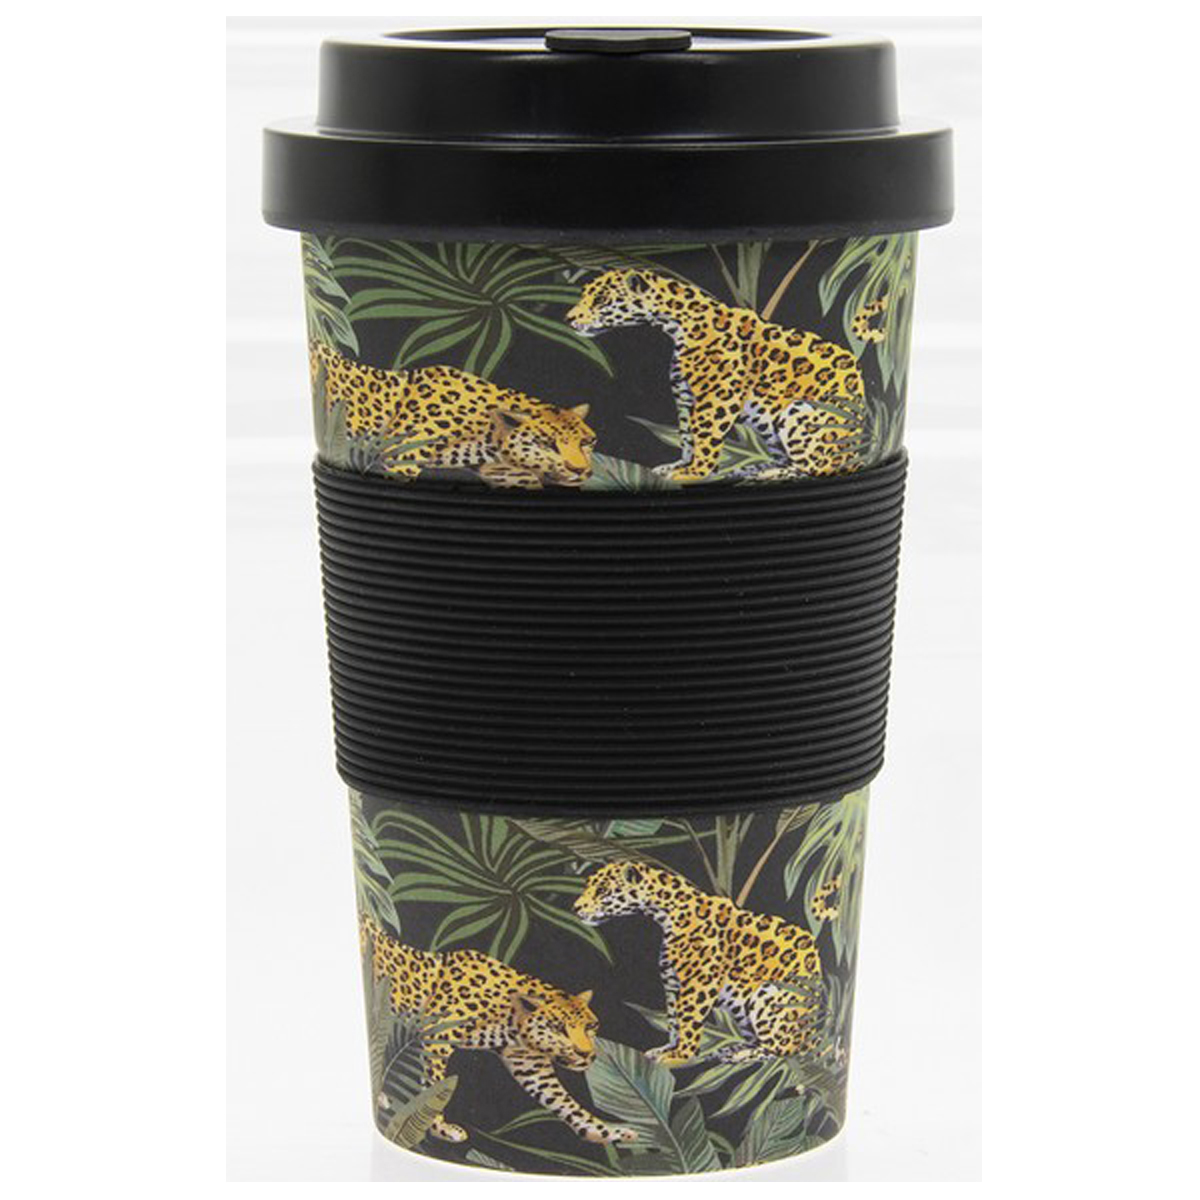 Mug de transport bambou \'Jungle Fever\' marron vert noir - 125x8 cm (350 ml) - [R0619]